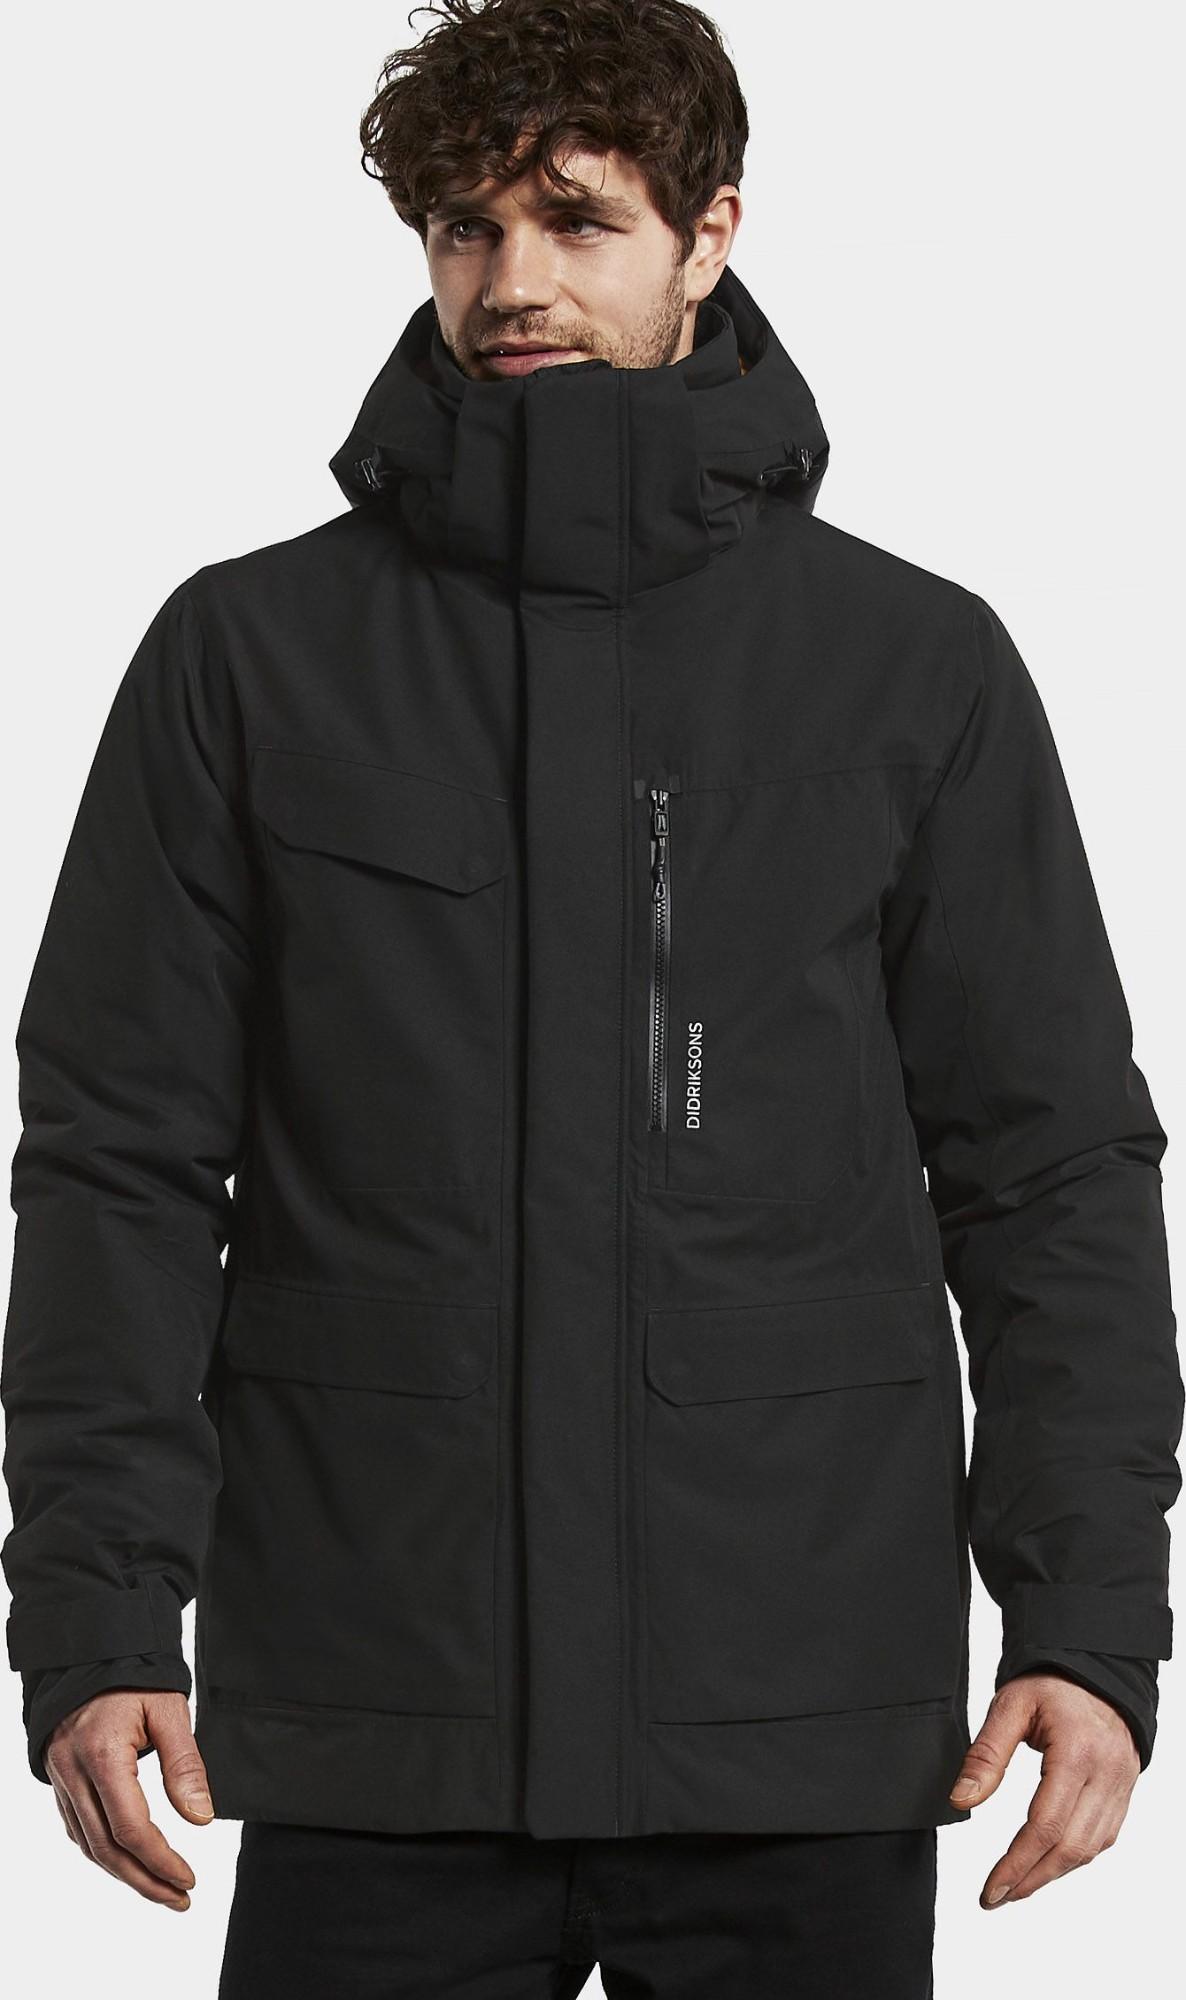 DIDRIKSONS Sebastian Jacket 2 Black S